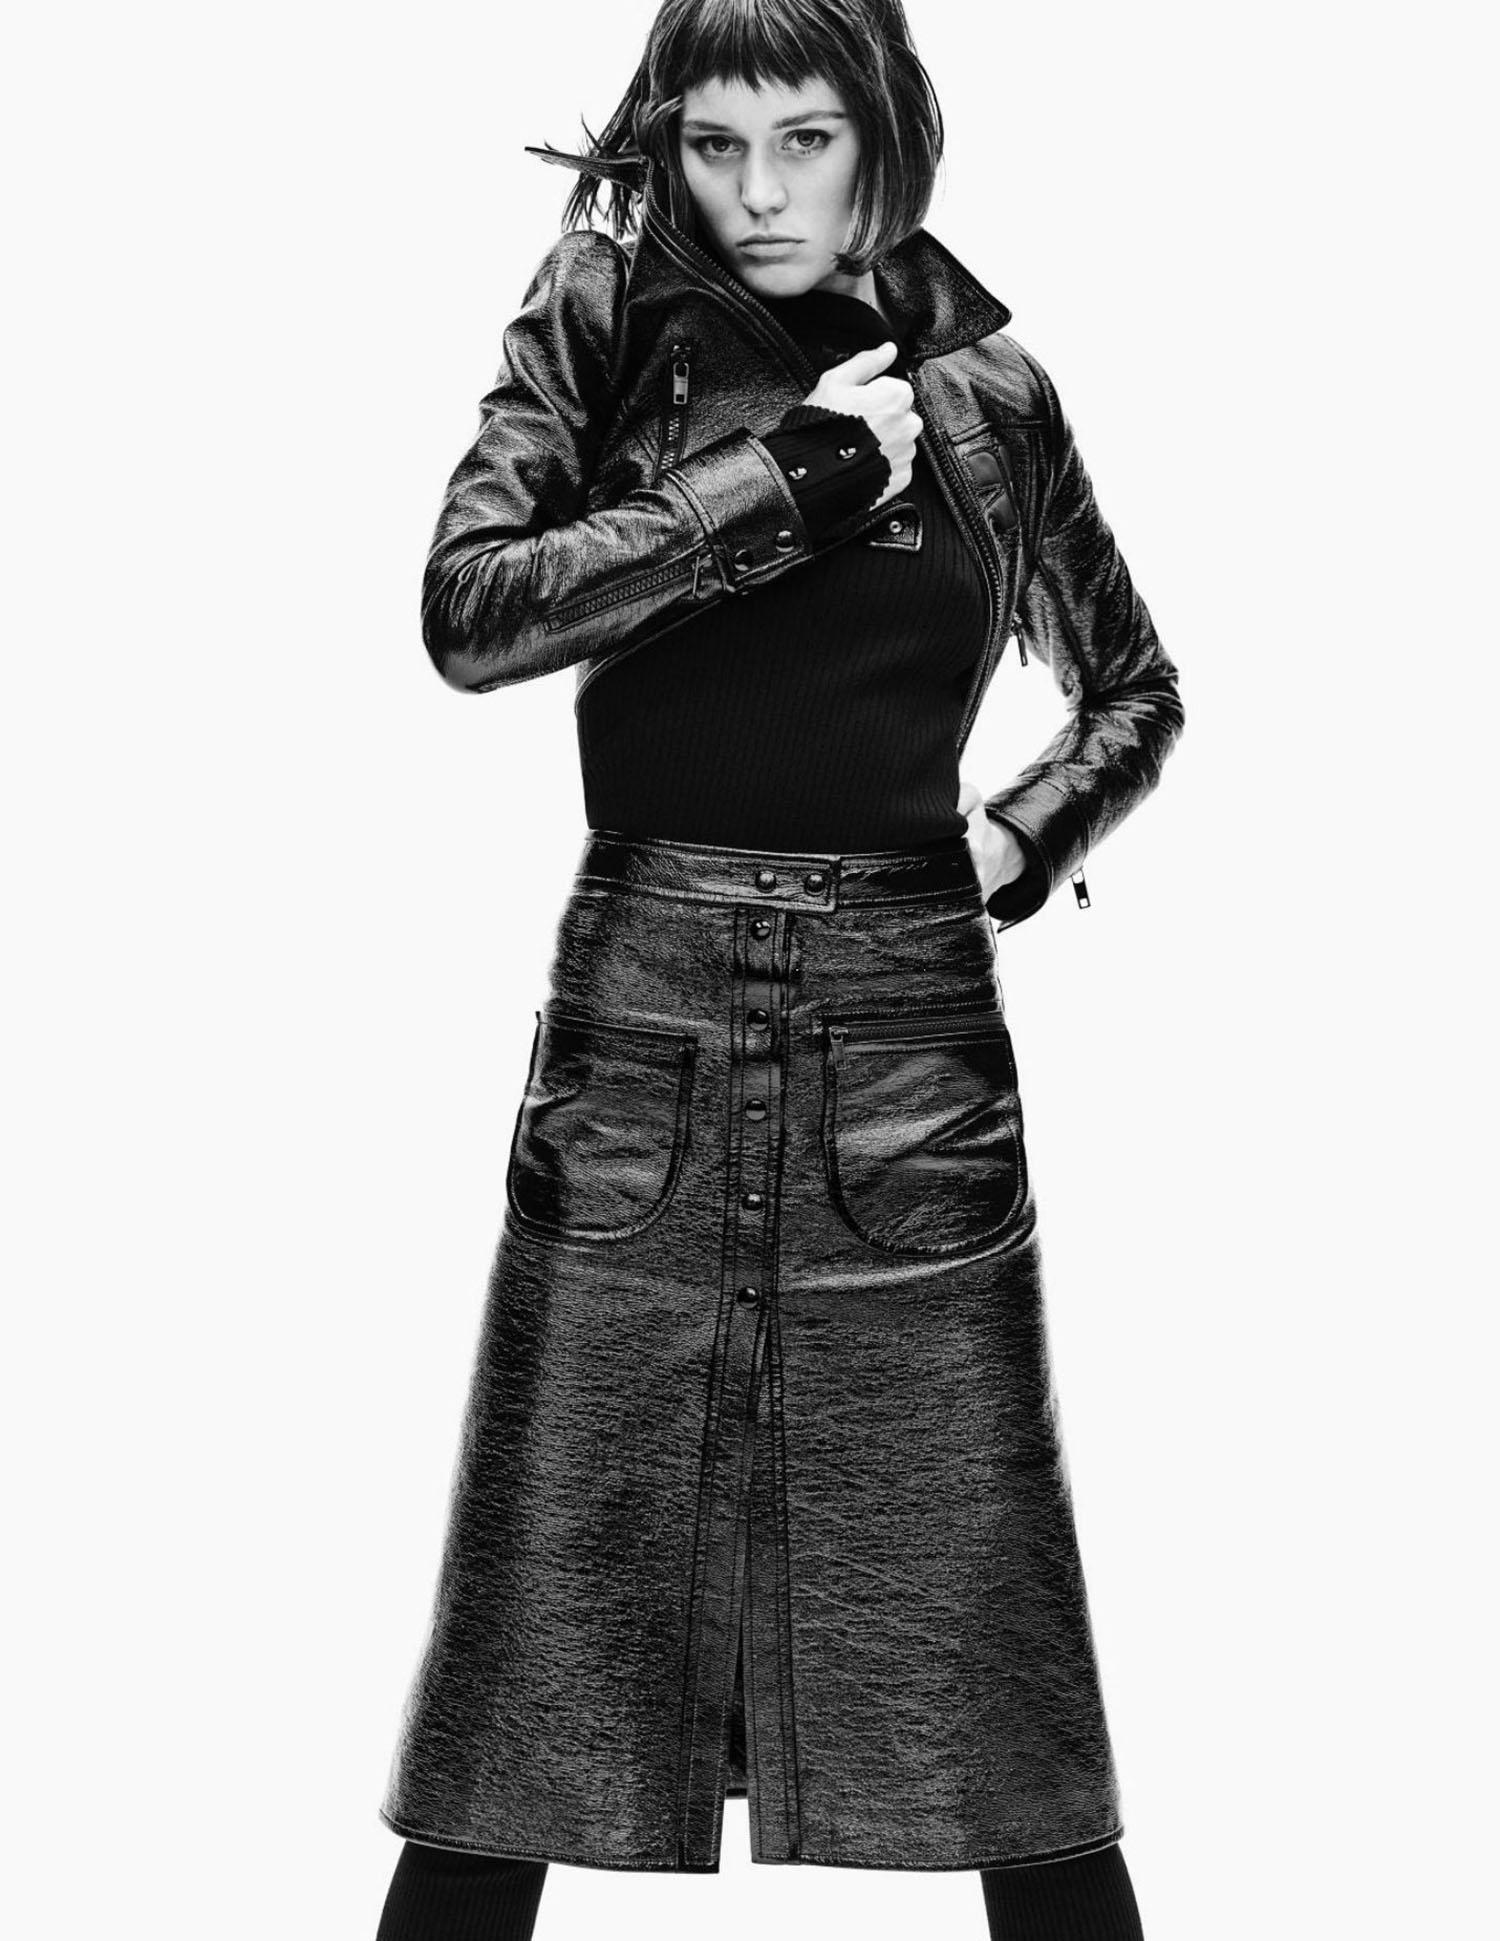 Vivienne Rohner by Nathaniel Goldberg for Vogue Paris June July 2021